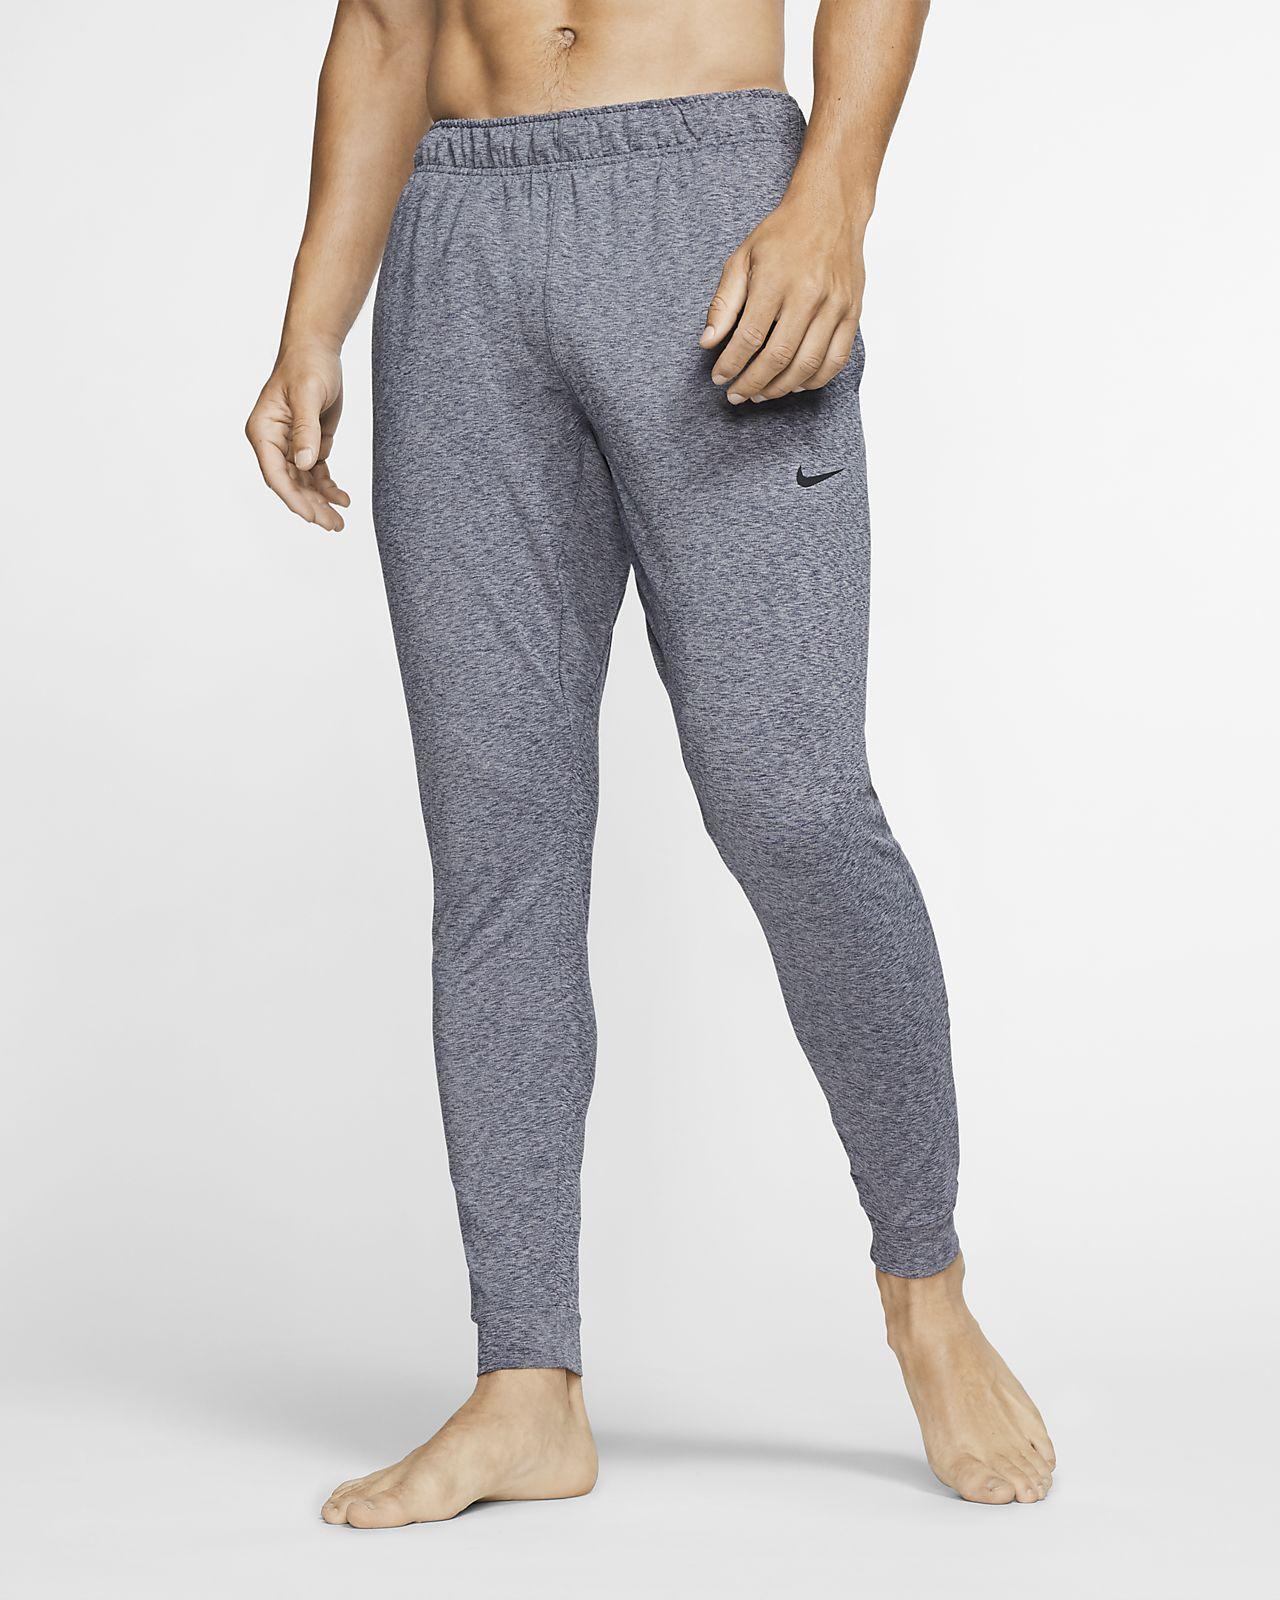 Nike Dri FIT yogabukser til herre